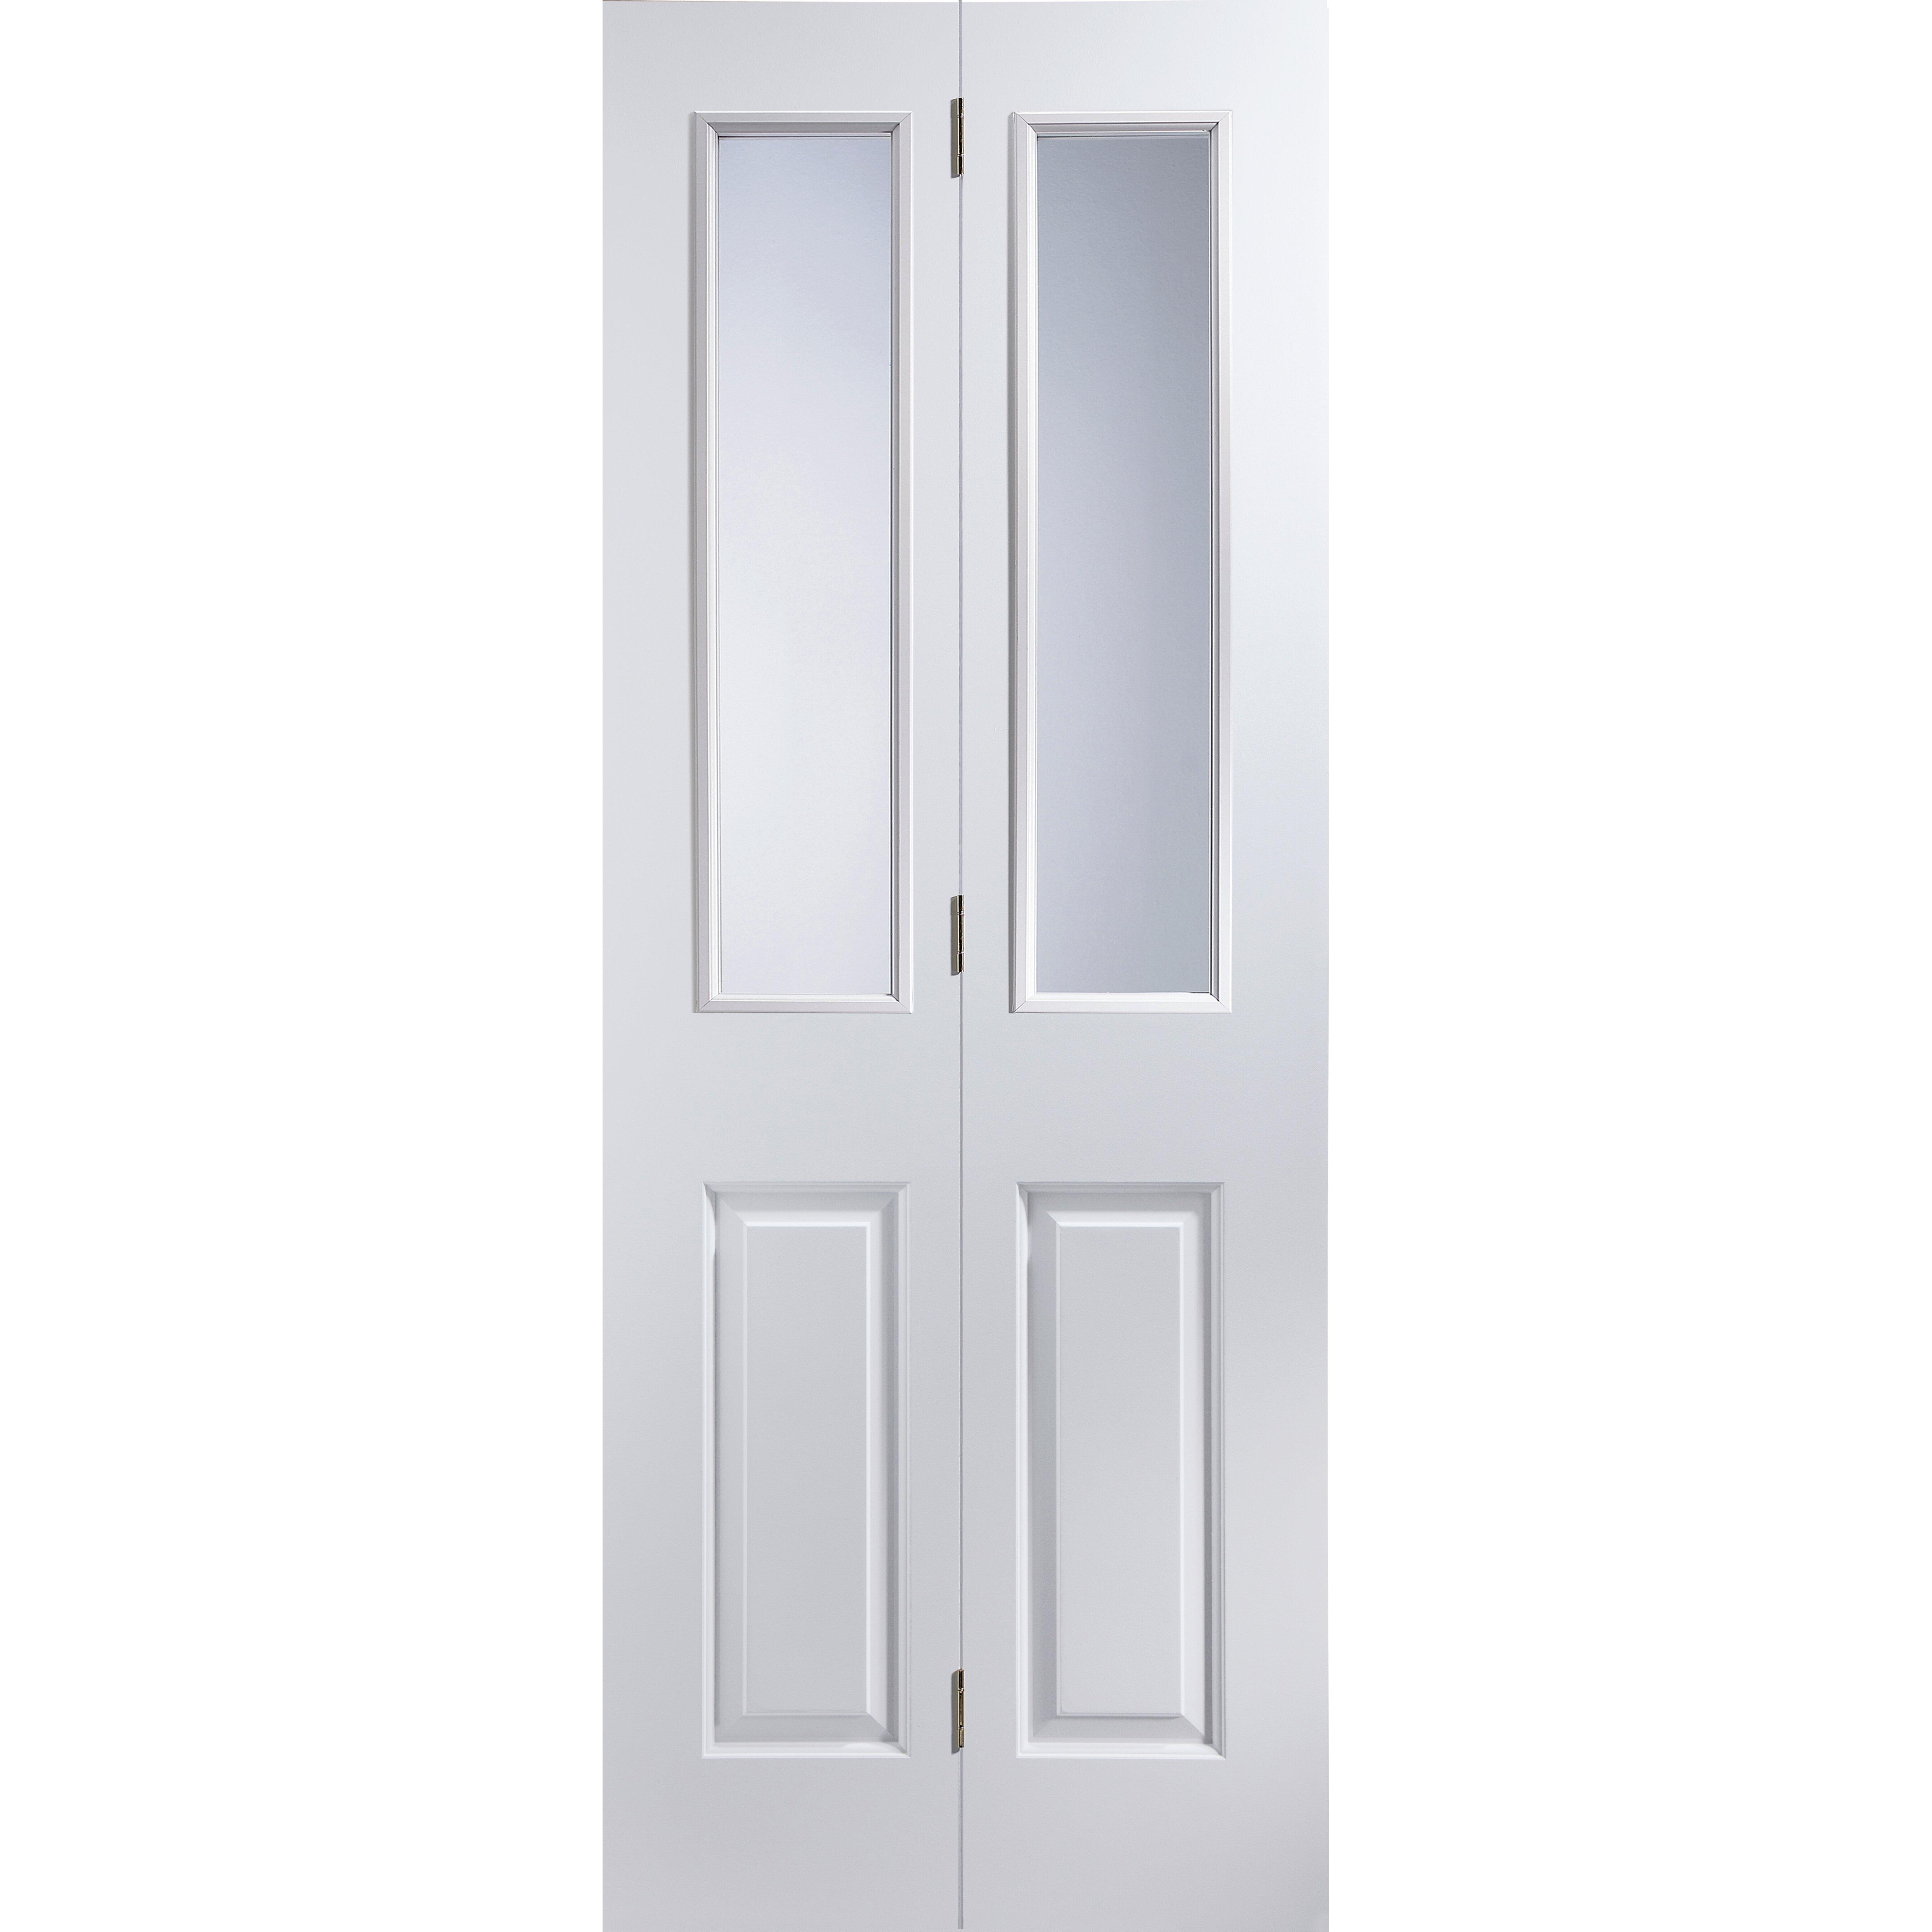 Garden doors rona build a doorframe and install an interior patio doors ebay image collections glass door interior doors u0026 patio doors baanklon Images